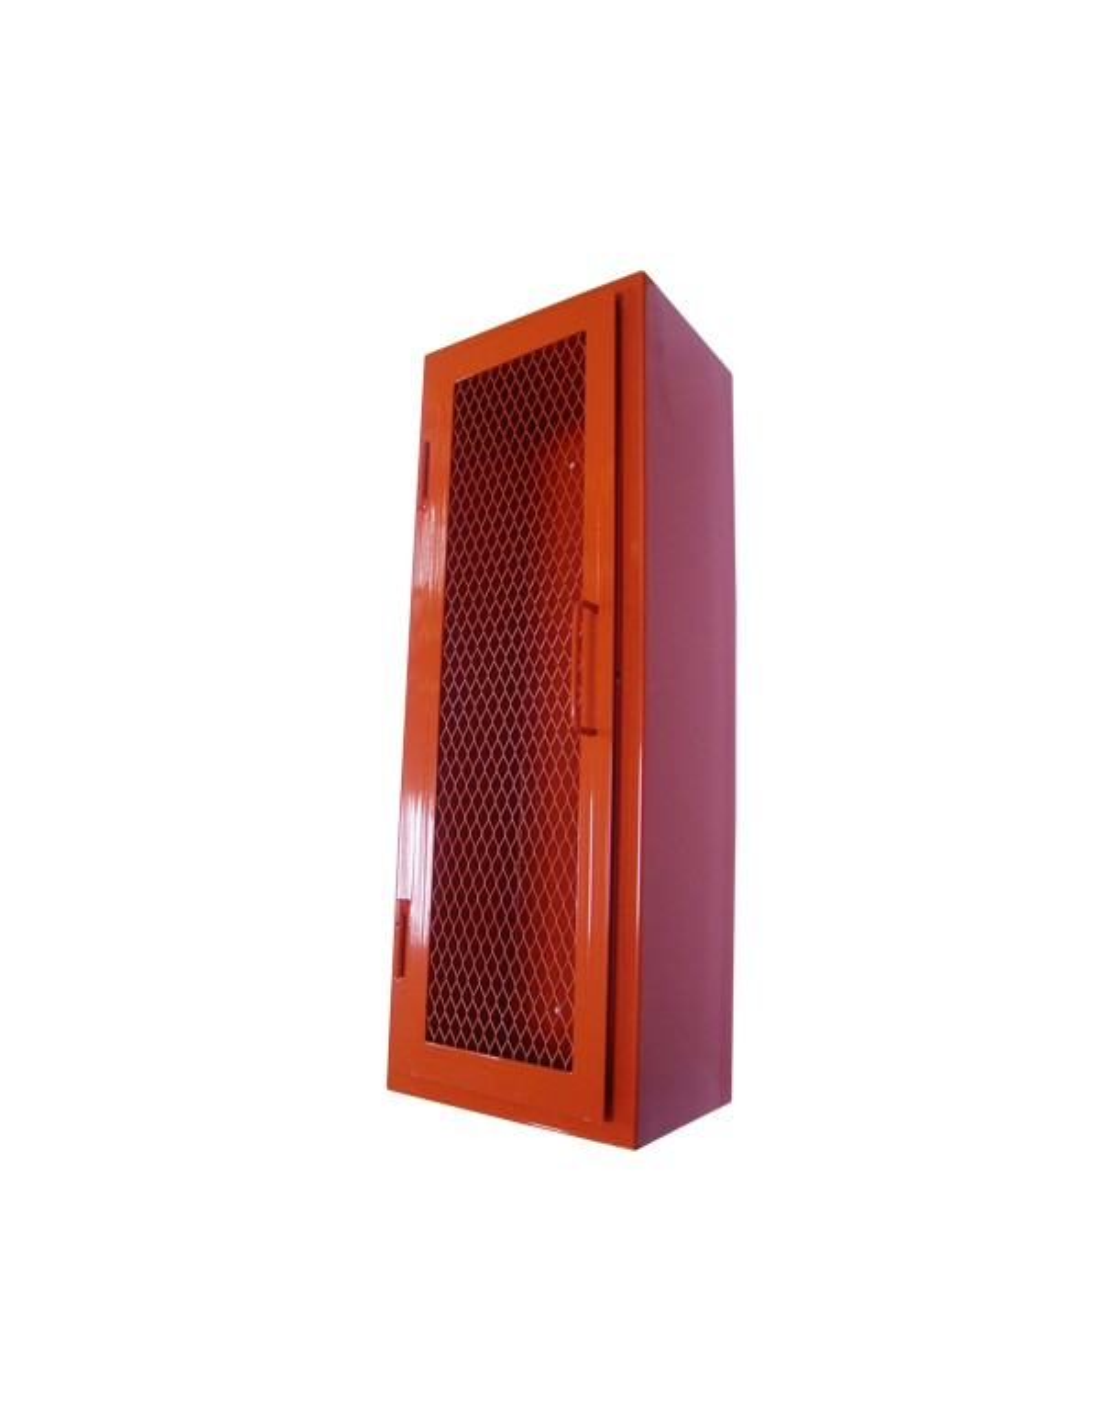 Gabinete extintor con puerta malla ossa sistemas contra - Puertas contra incendios ...